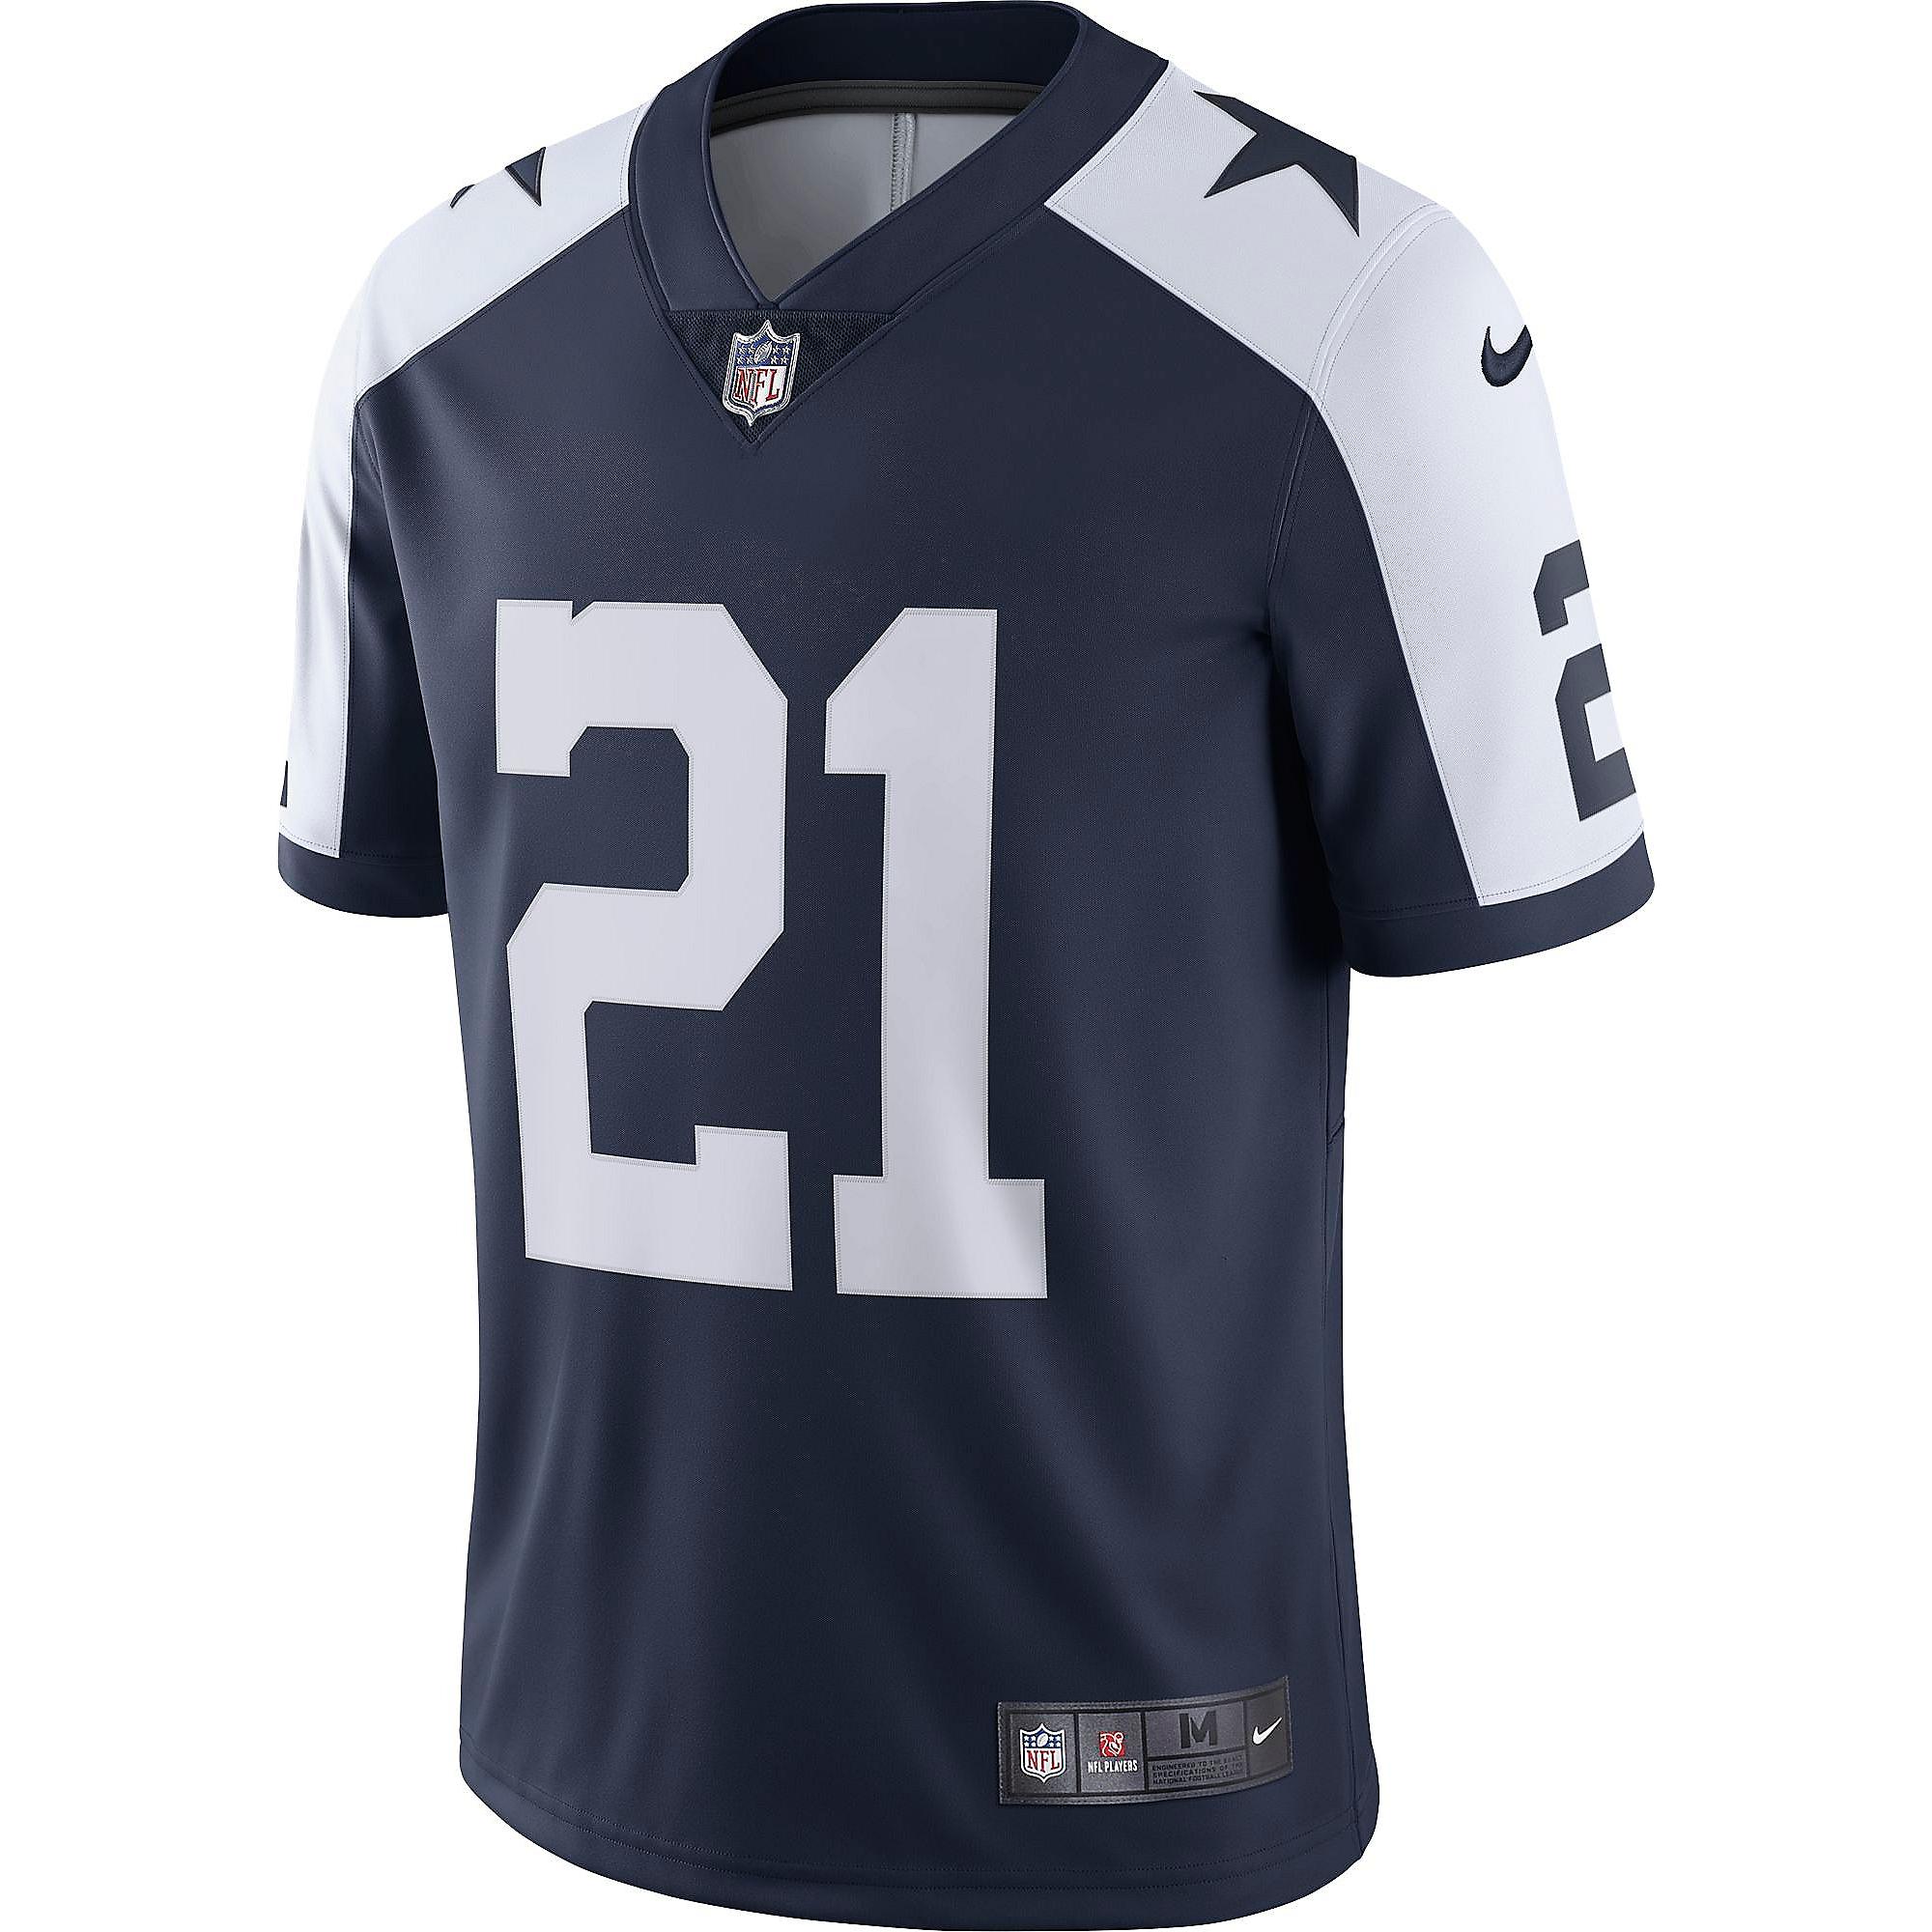 uk availability 98c92 e00a6 Dallas Cowboys Ezekiel Elliott #21 Nike Vapor Untouchable ...